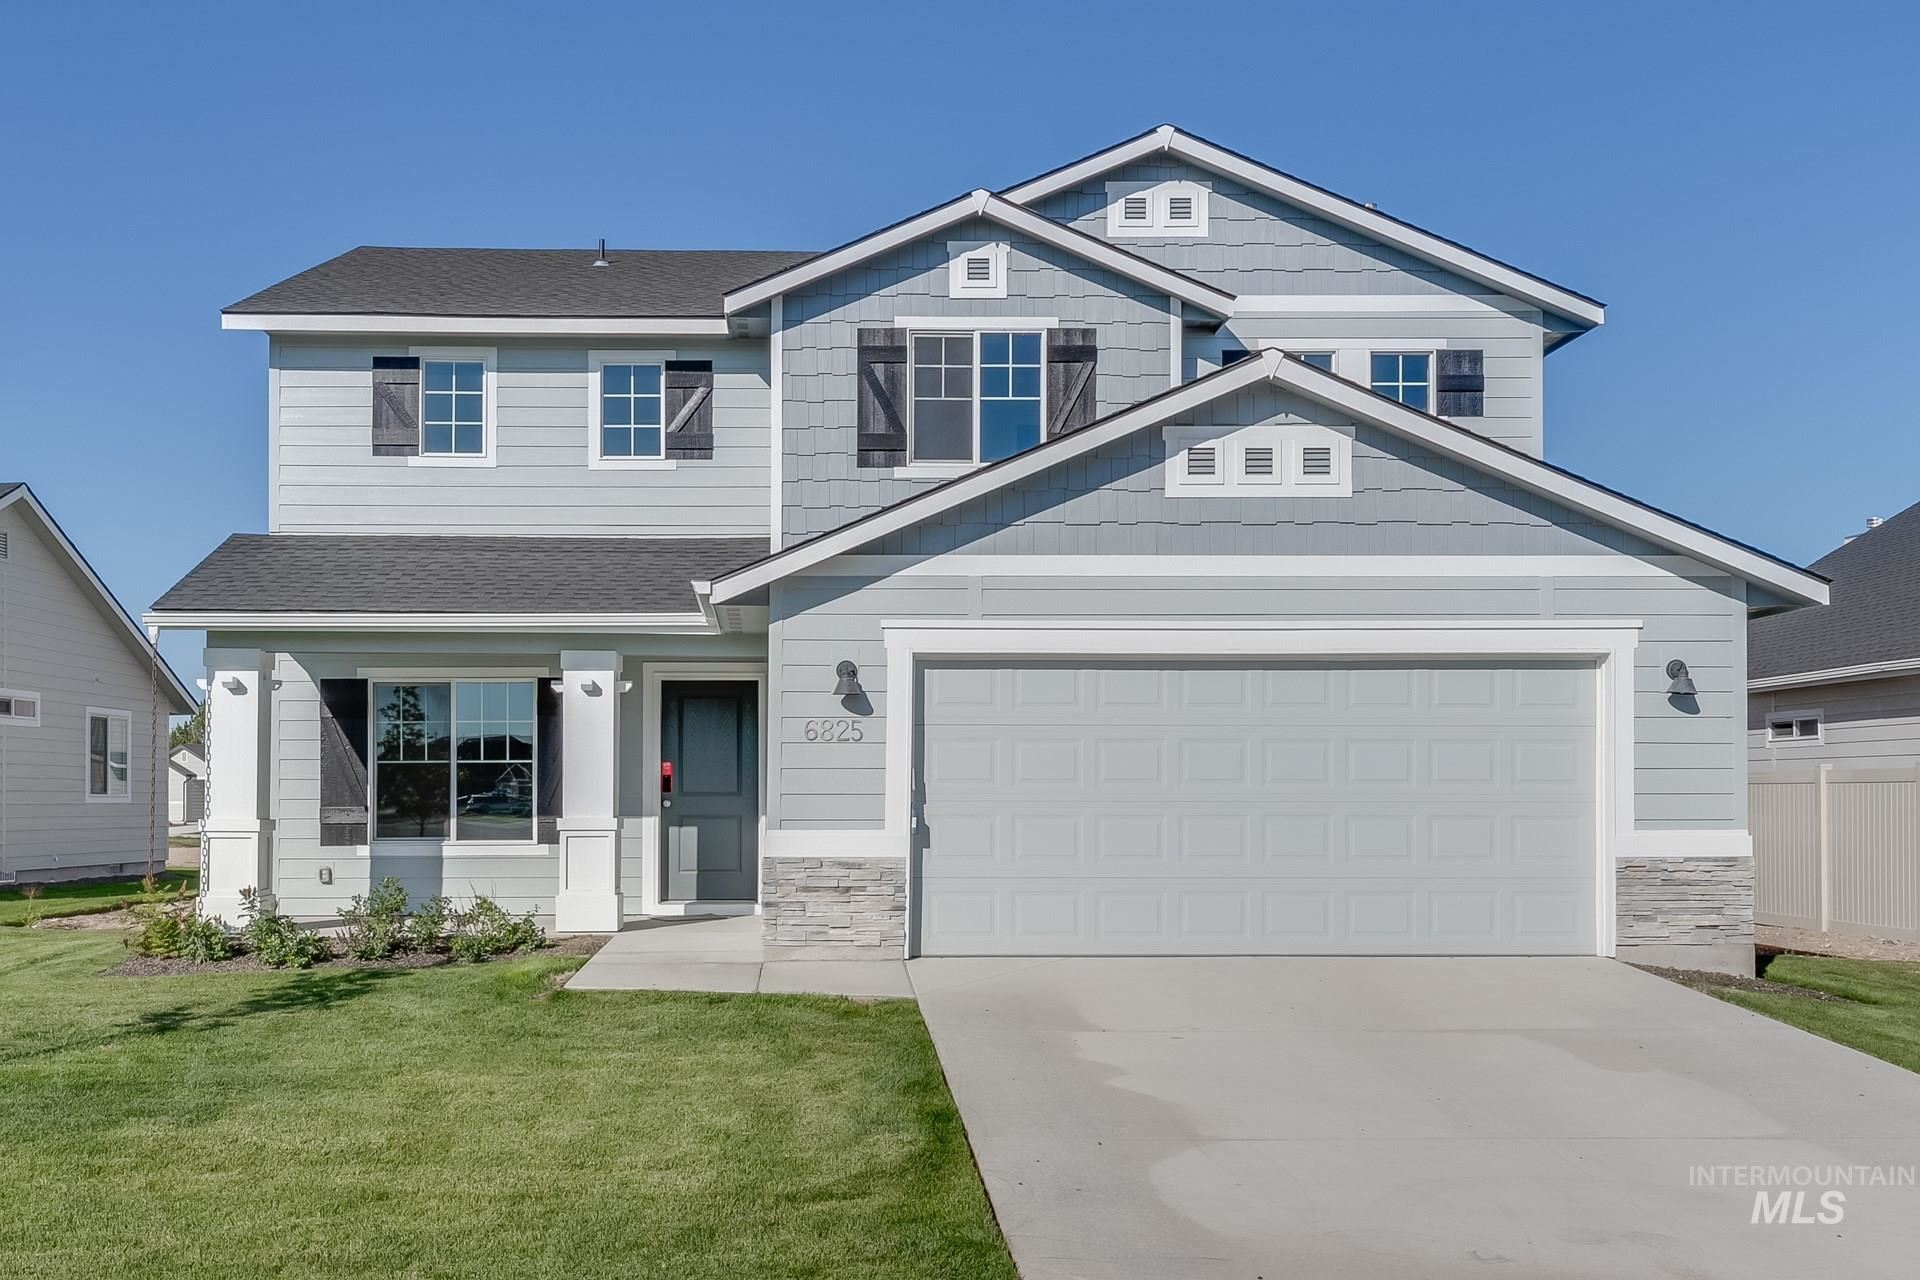 Photo of 6766 E Zaffre Ridge St, Boise, ID 83716 (MLS # 98768626)